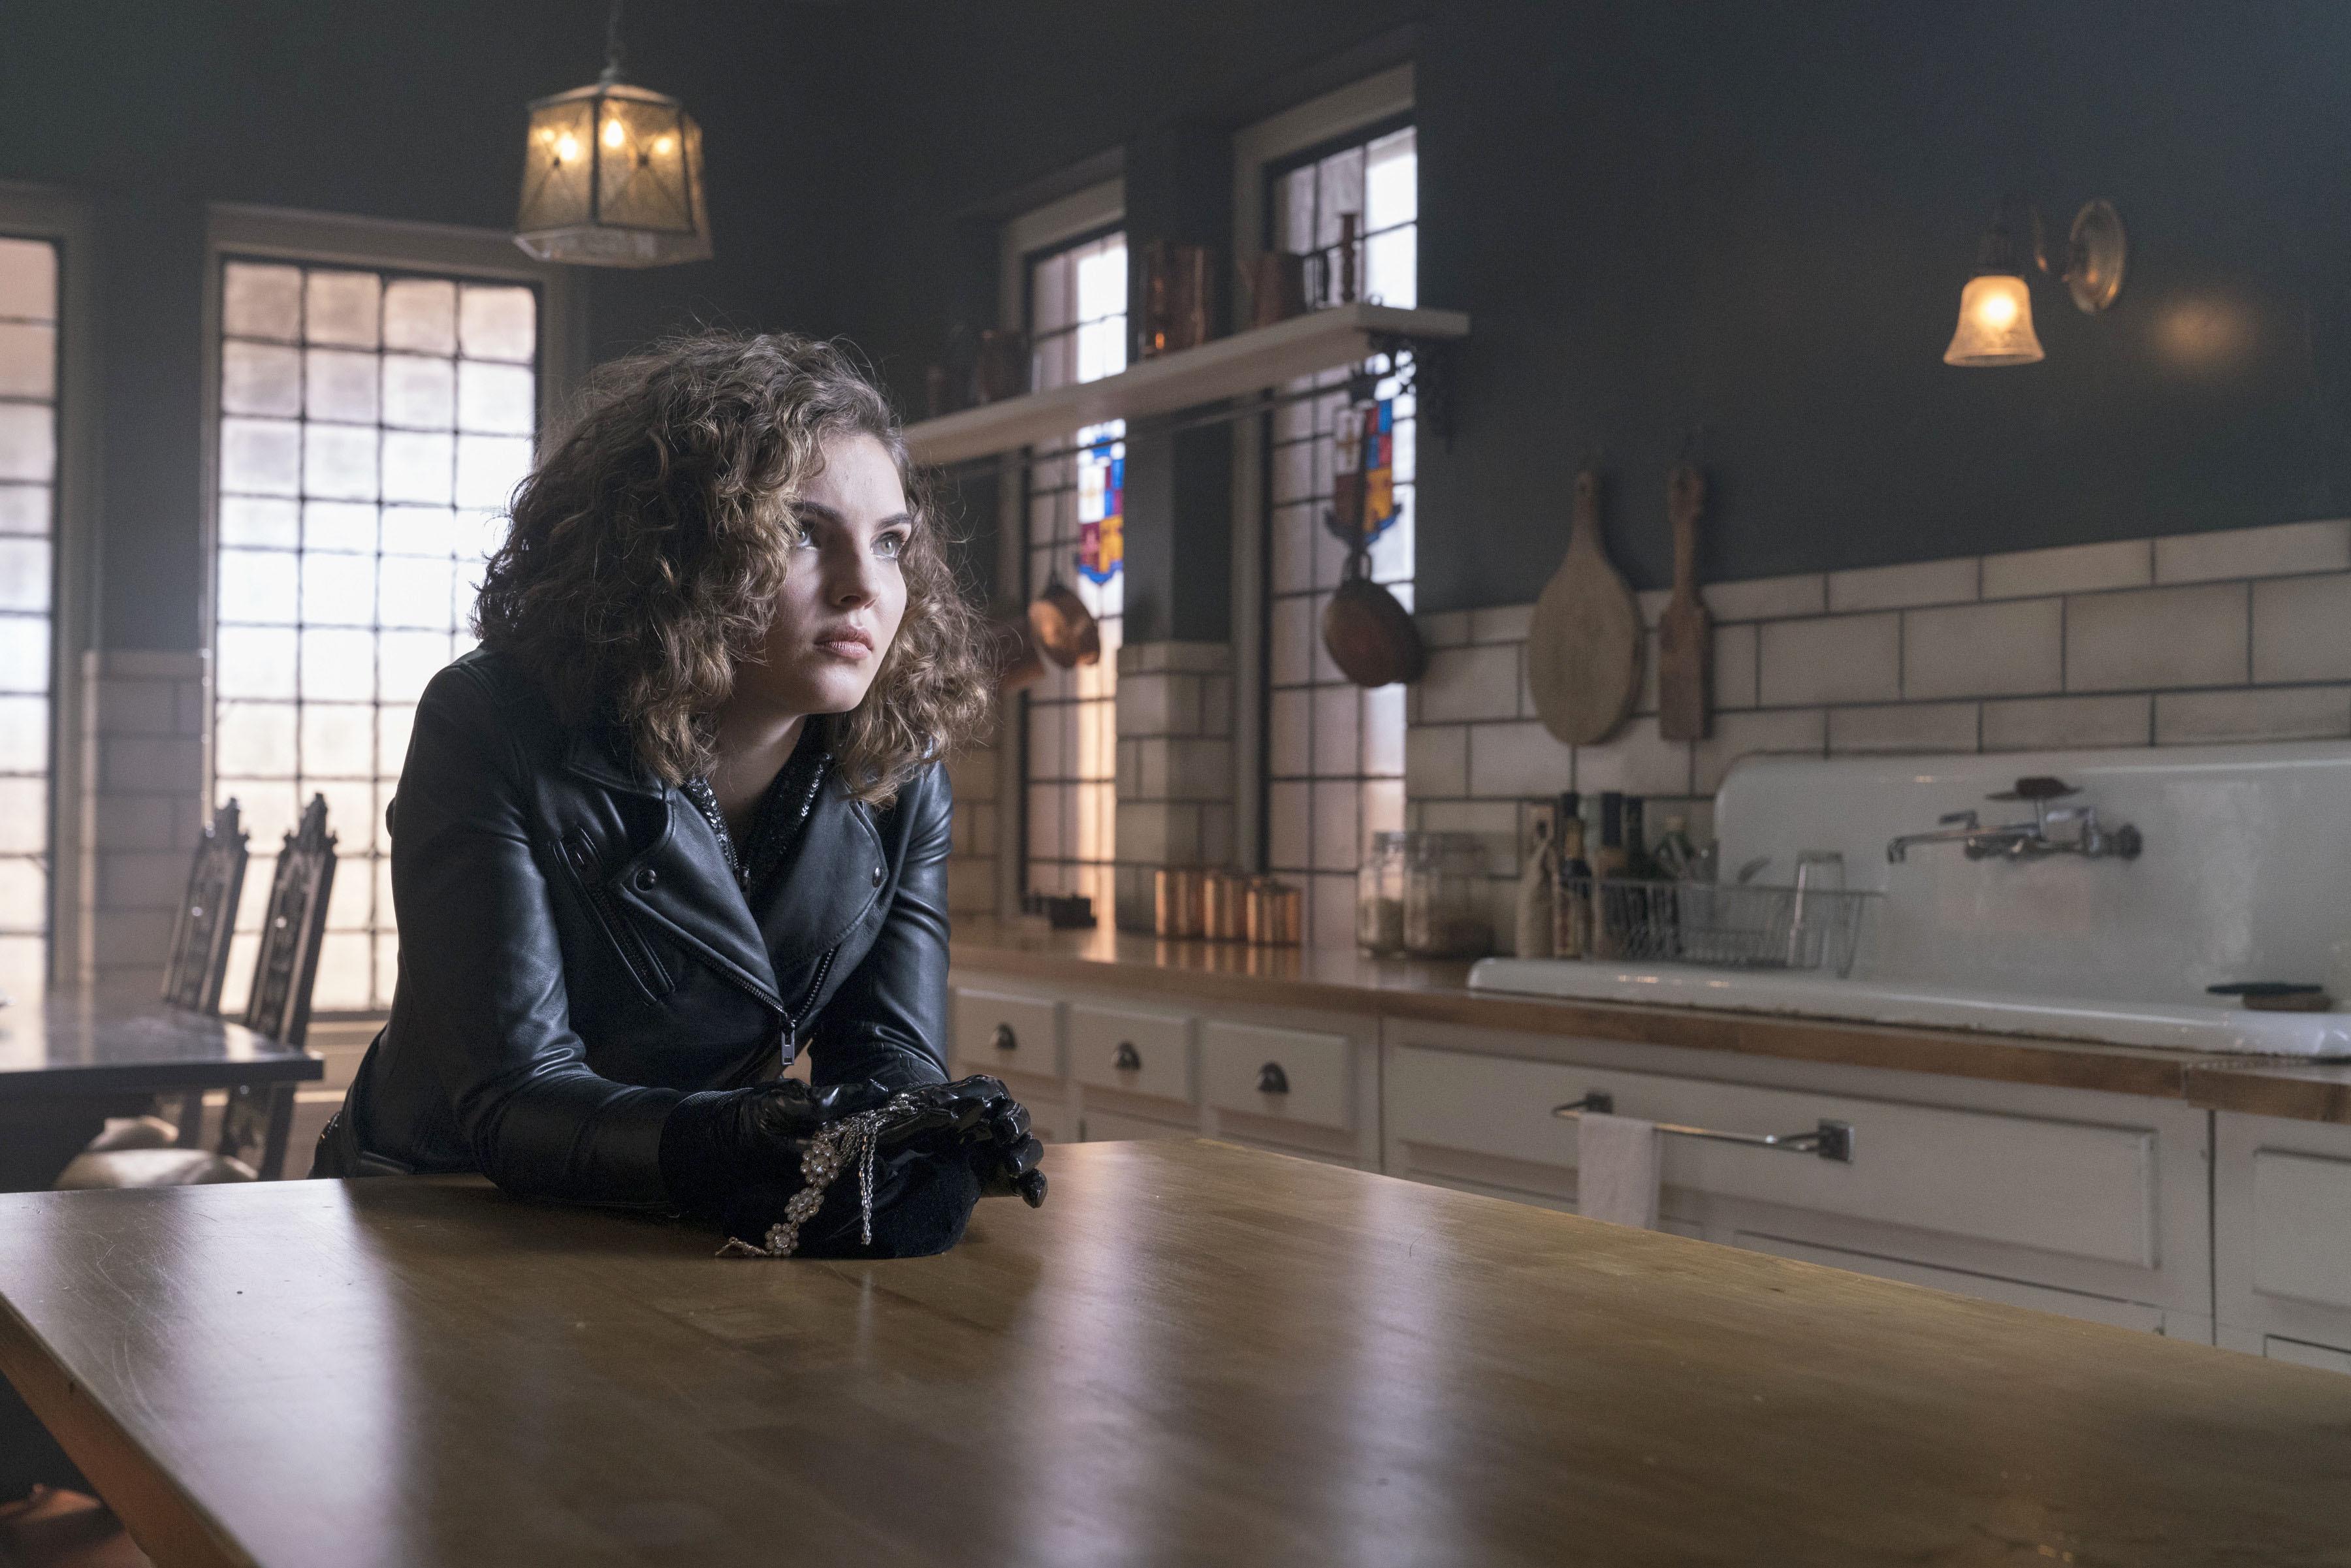 Camren Bicondova Gotham Season 4: Camren Bicondova Gotham Season 4 2018, HD Tv Shows, 4k